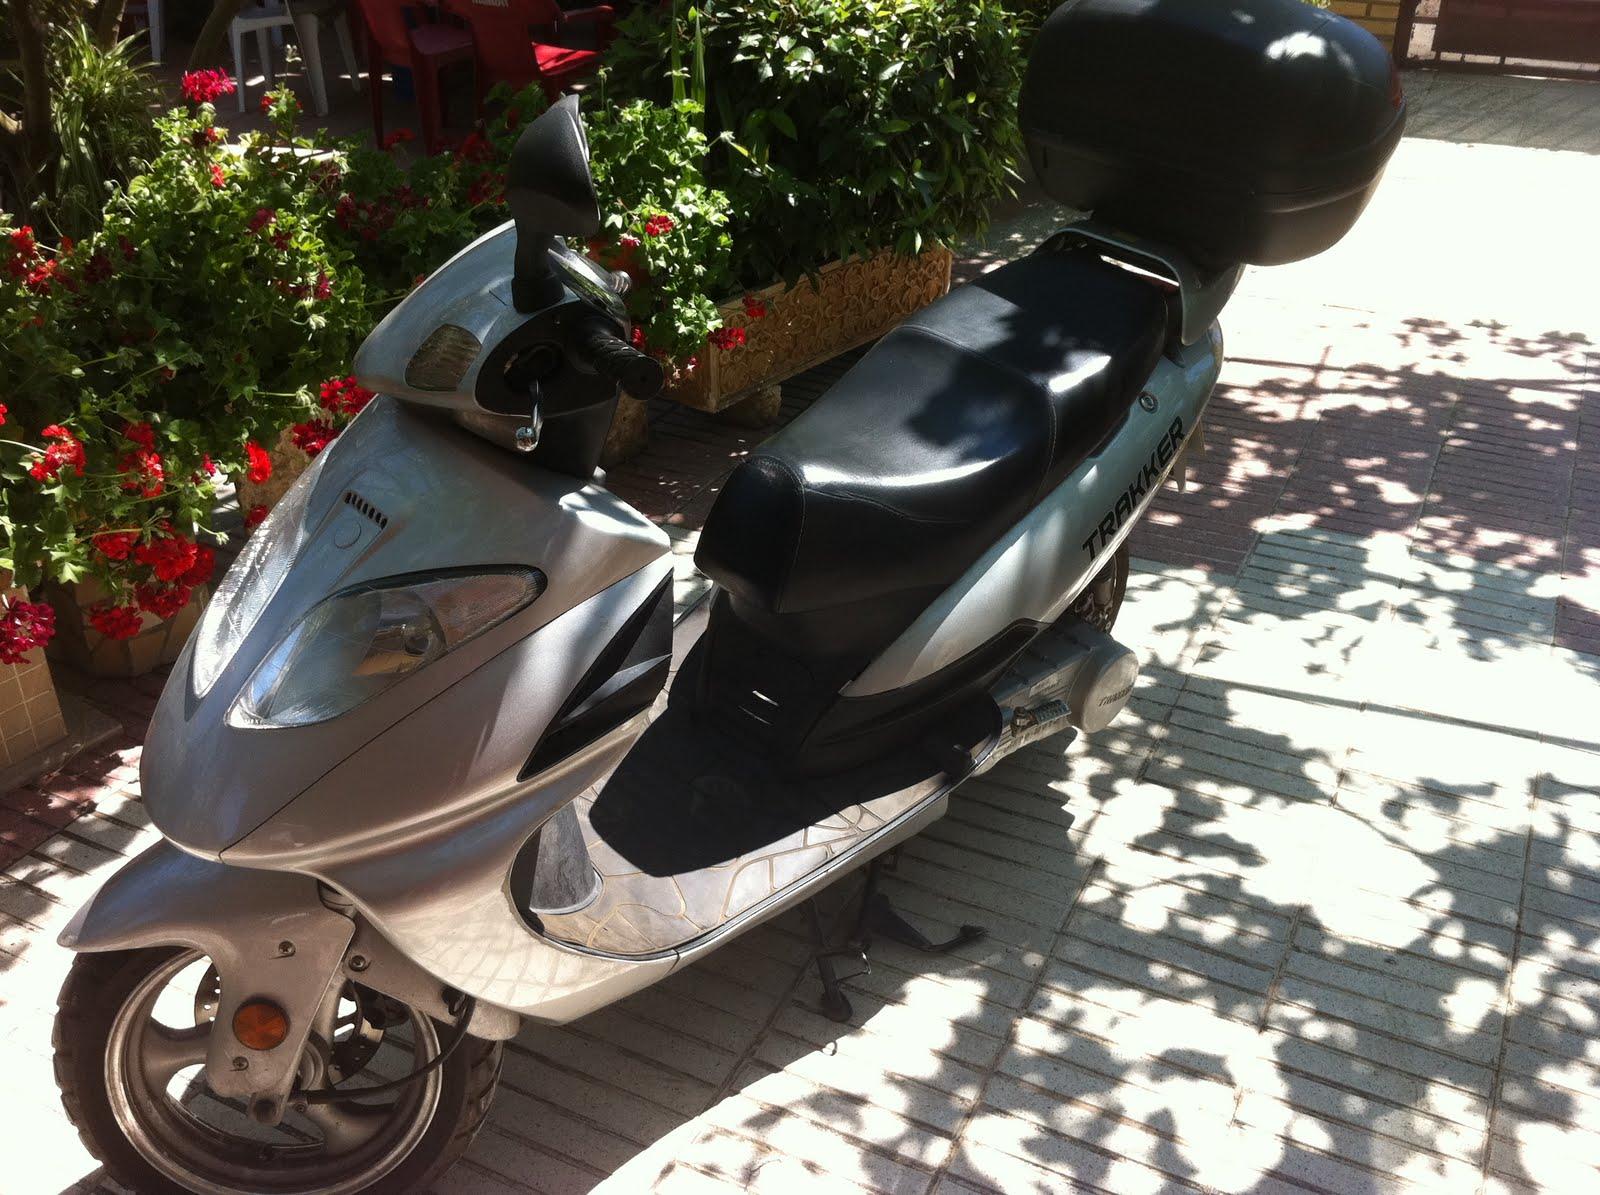 venta de motos de segunda mano en zaragoza: